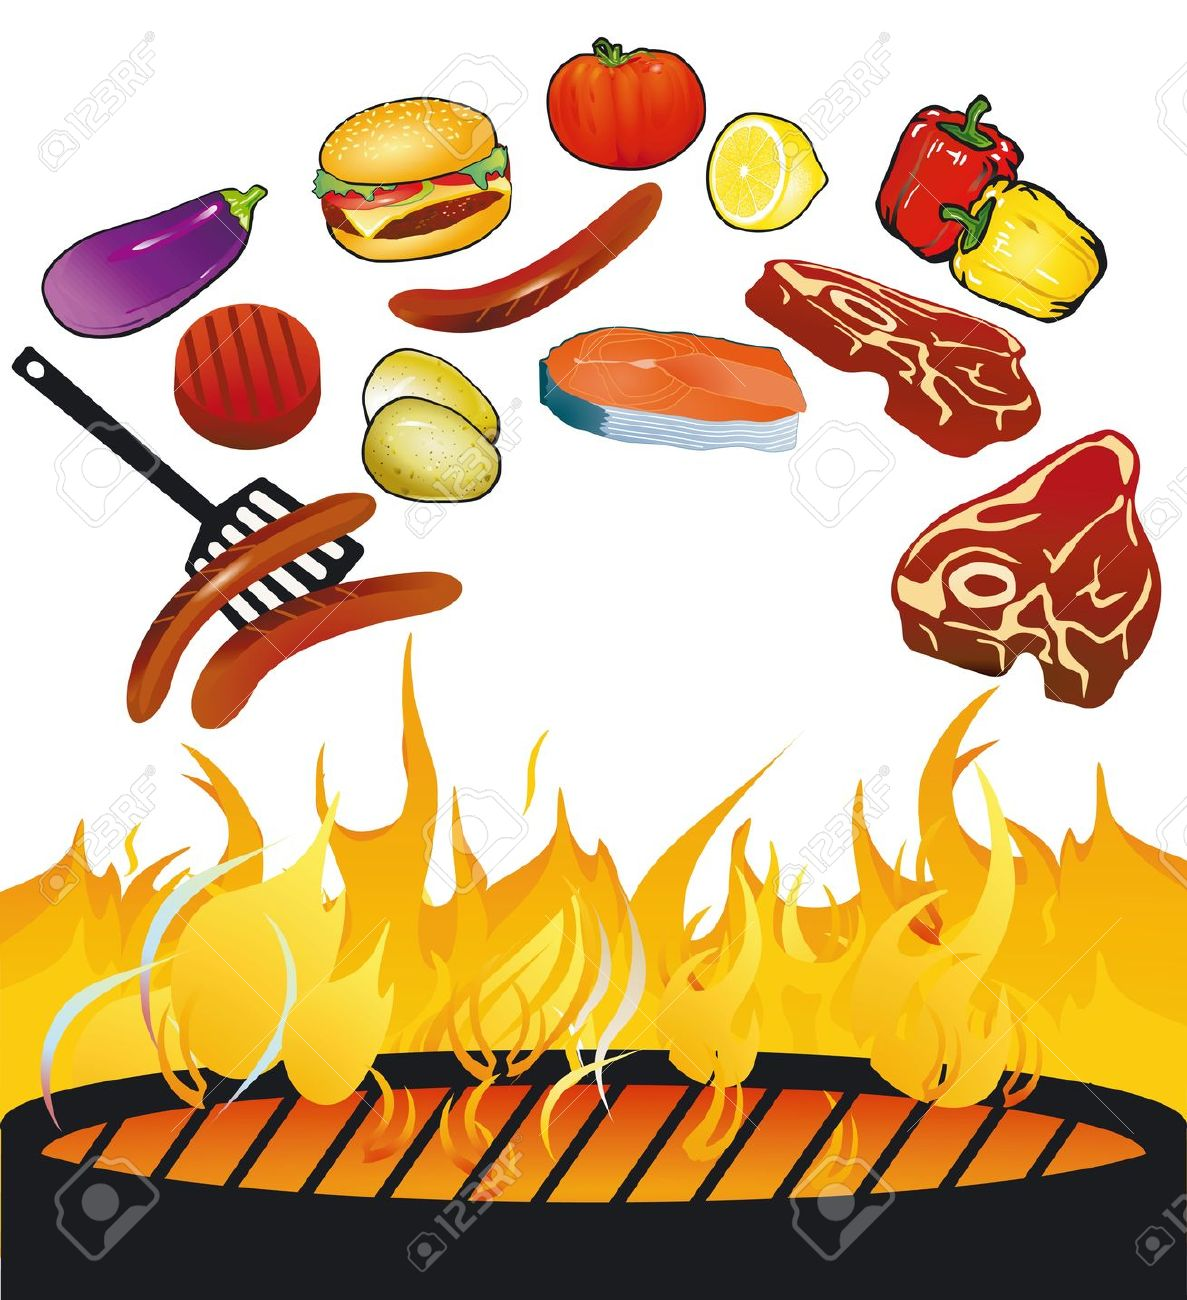 Bbq food clipart clip art free download Bbq food clipart 5 » Clipart Station clip art free download